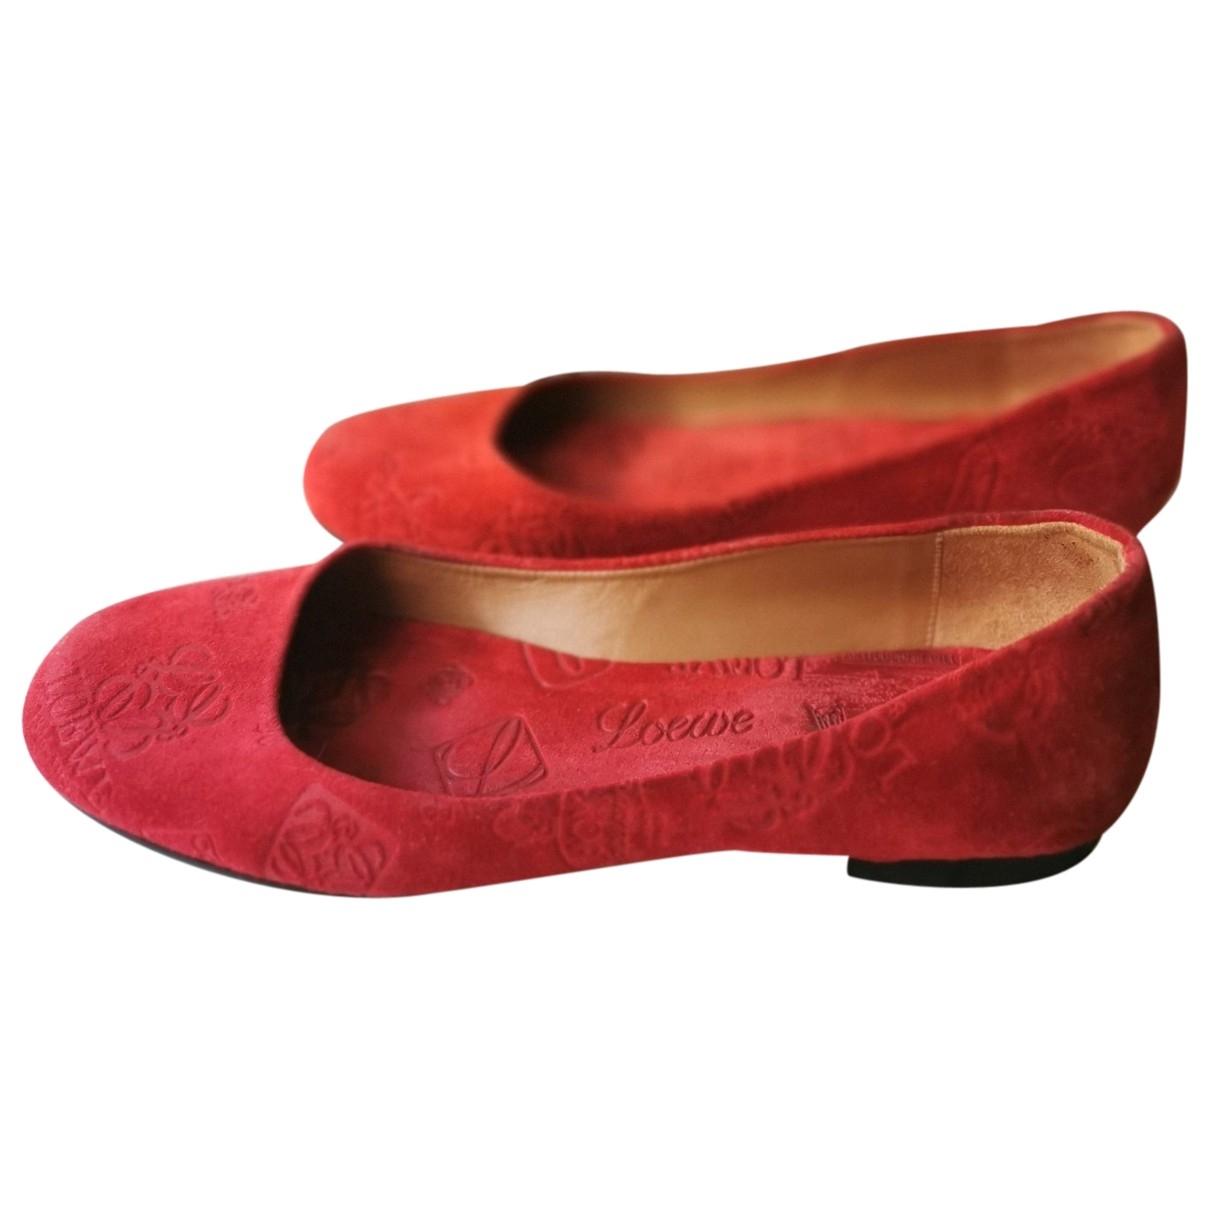 Loewe \N Red Suede Ballet flats for Women 37 EU